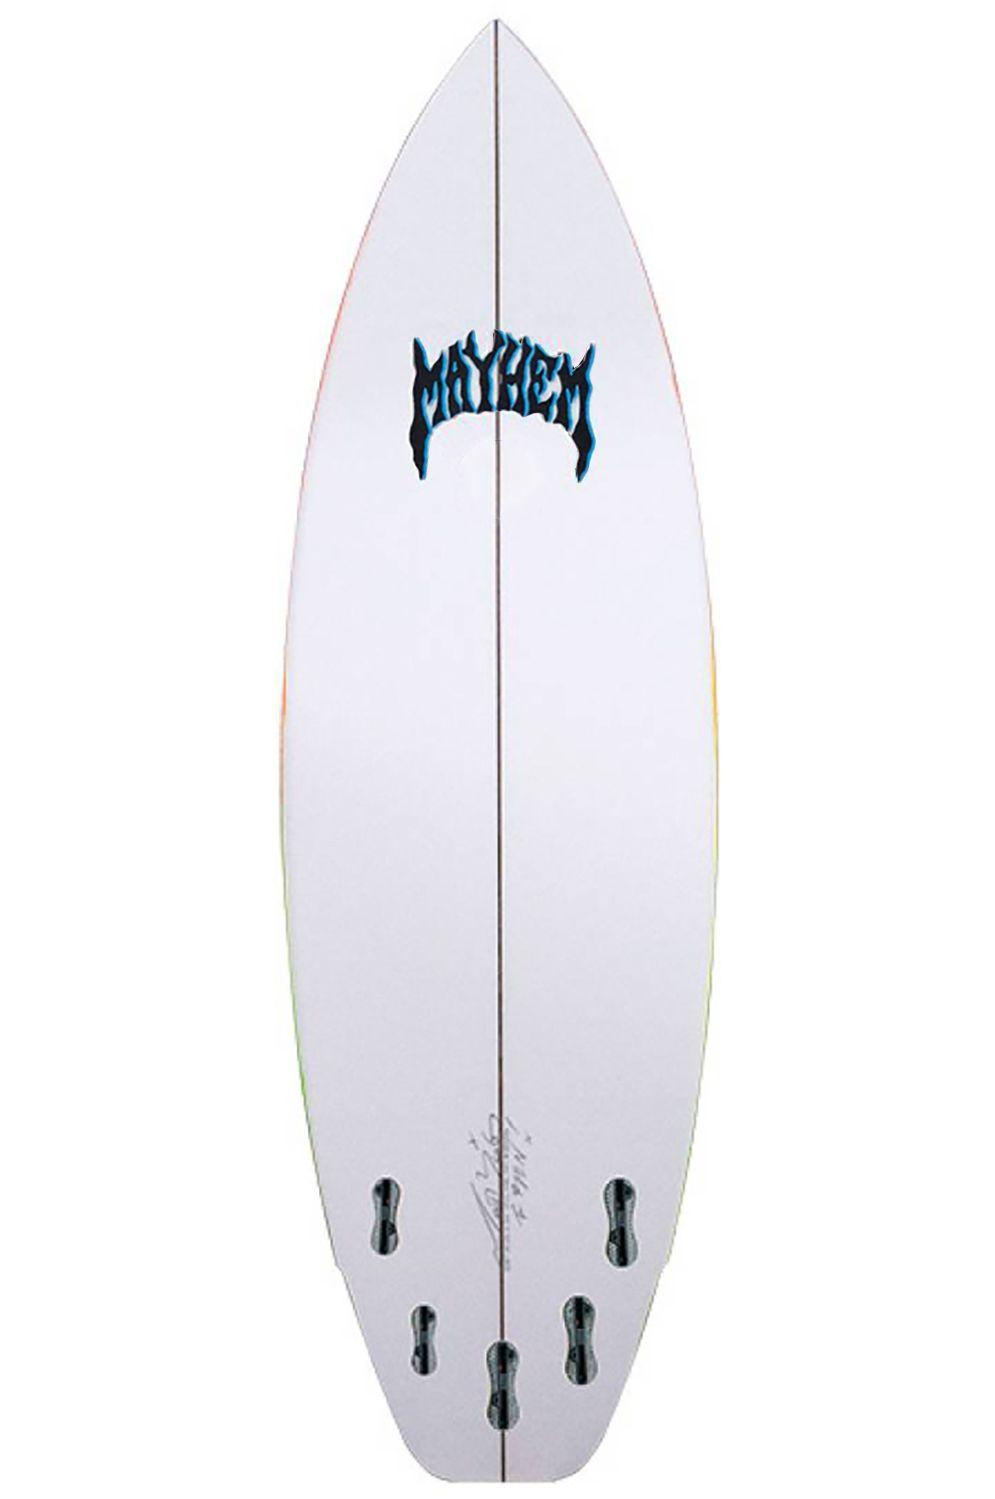 Prancha Surf Lost 6'0 RAD RIPPER Squash Tail - Color FCS II Multisystem 6ft0